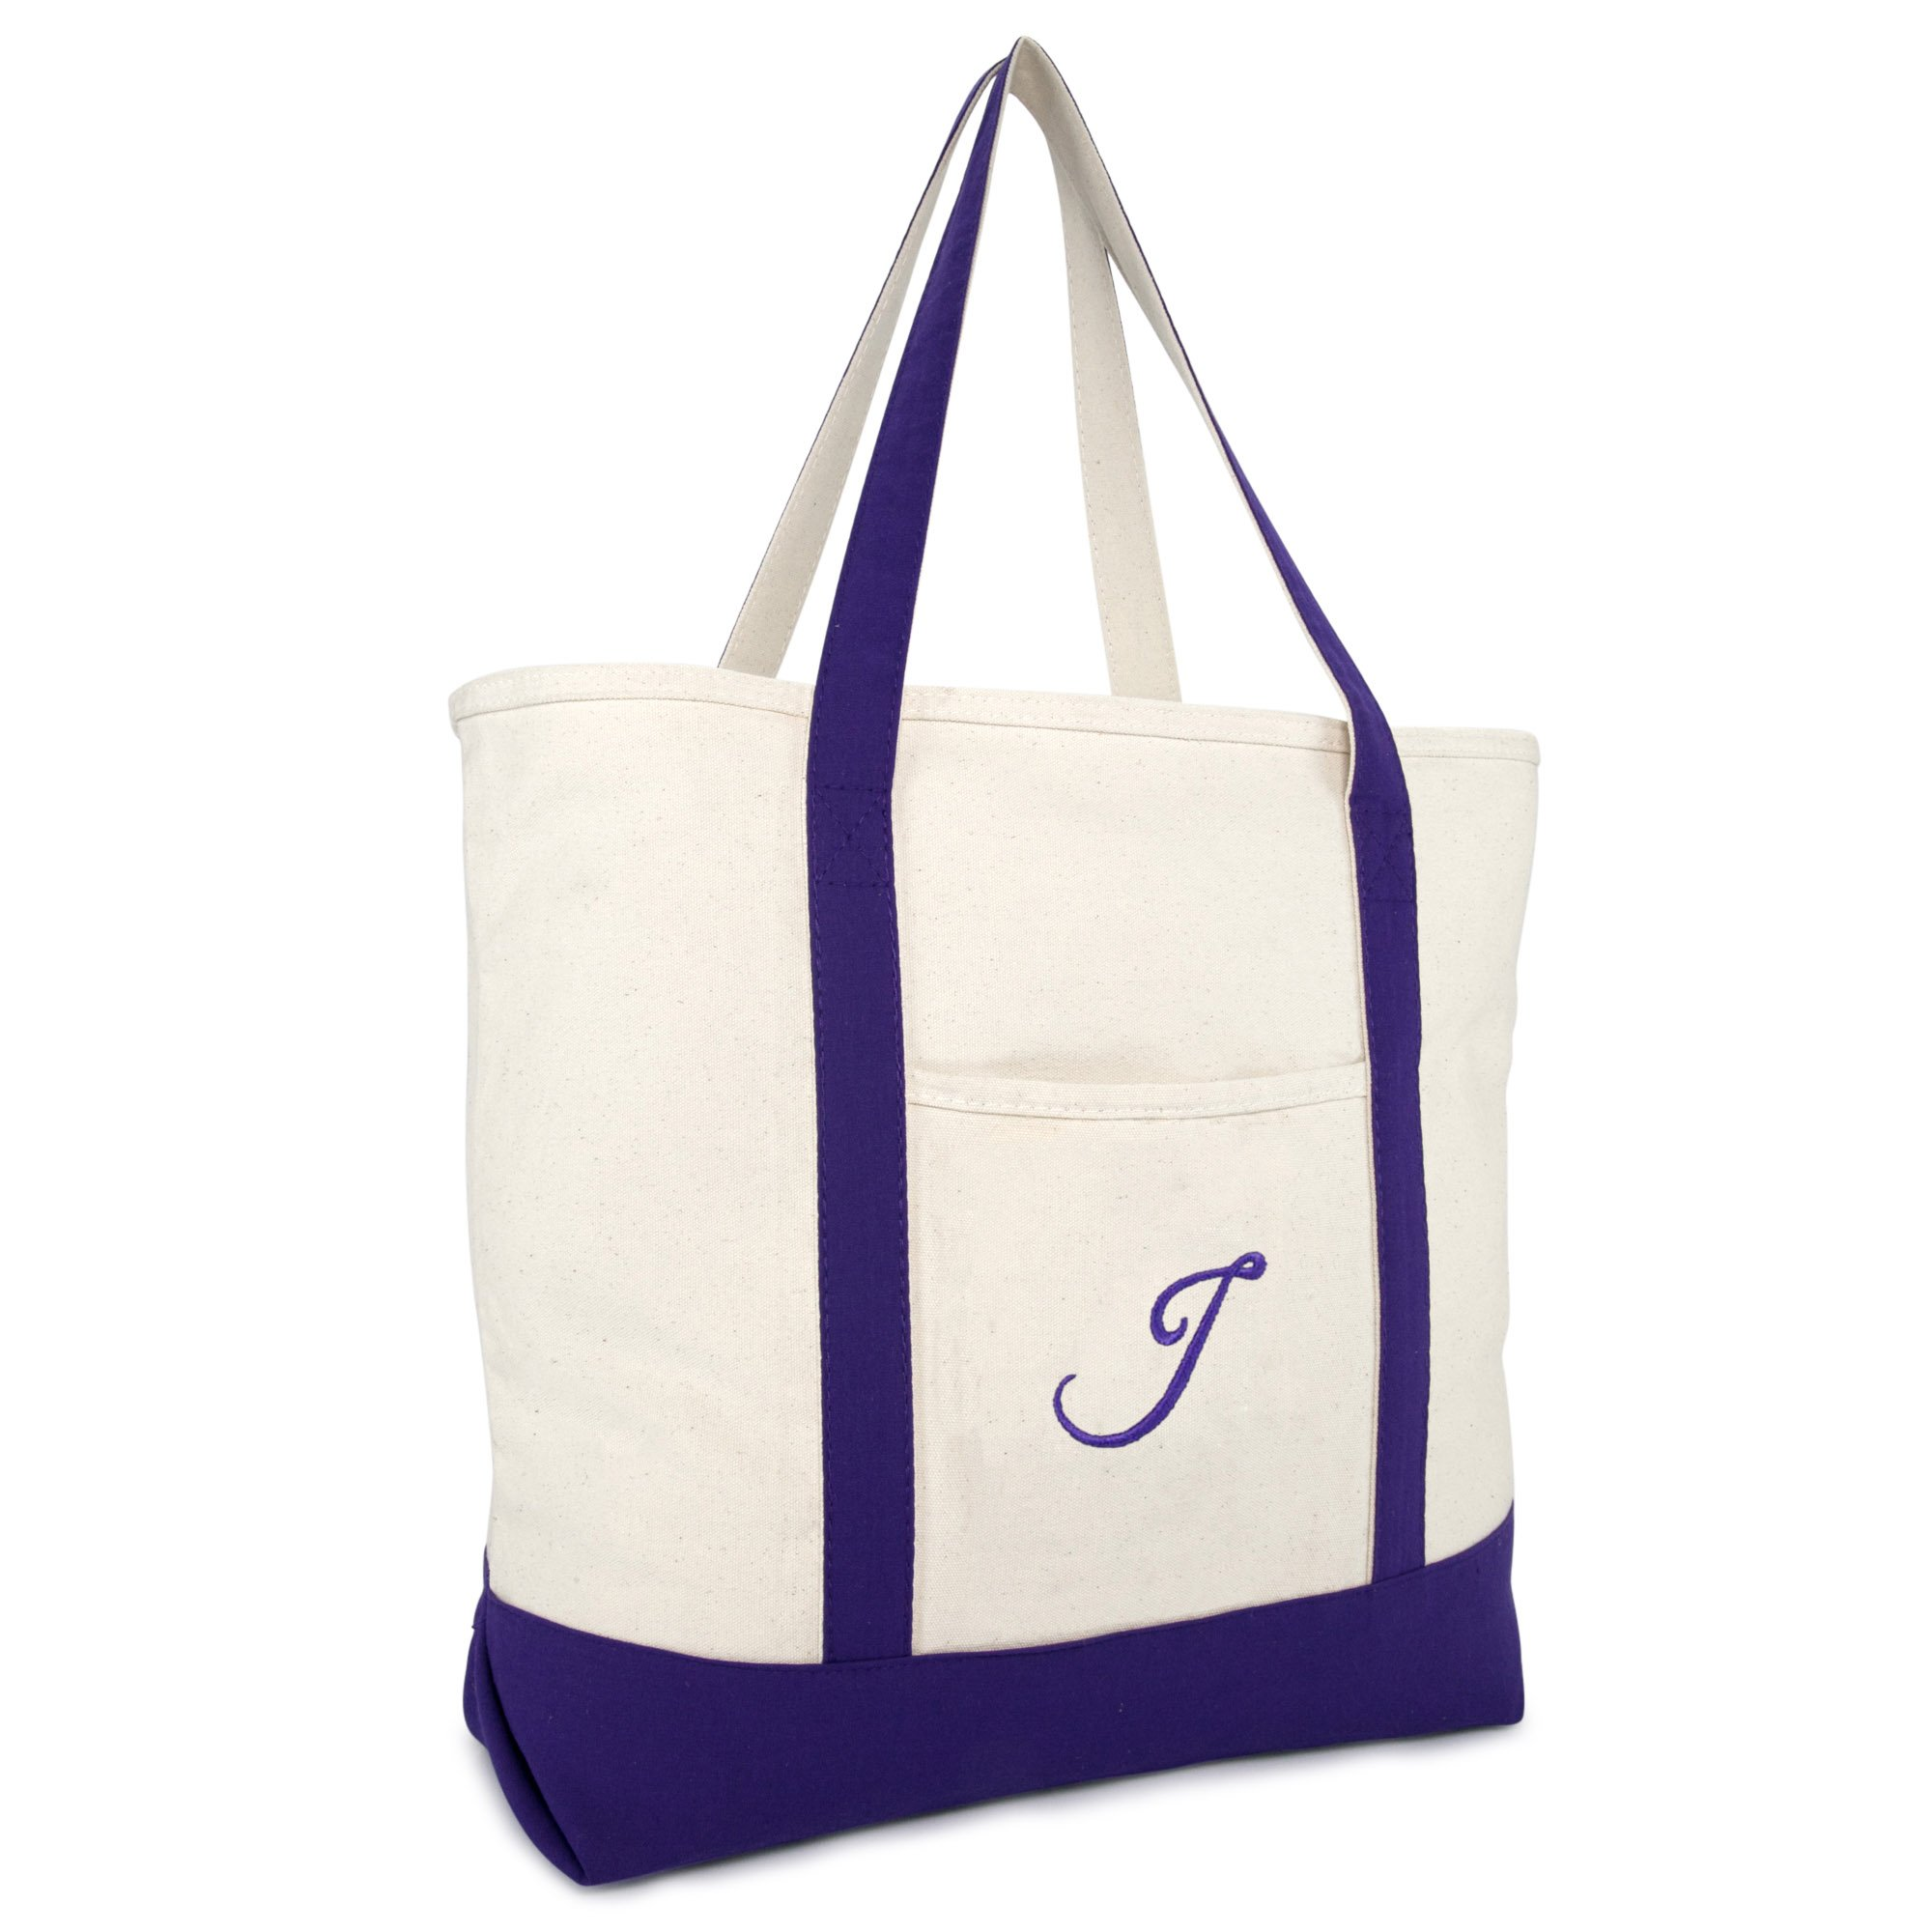 DALIX Personalized Shopping Tote Bag Monogram Purple Ballent Zippered Letter- J